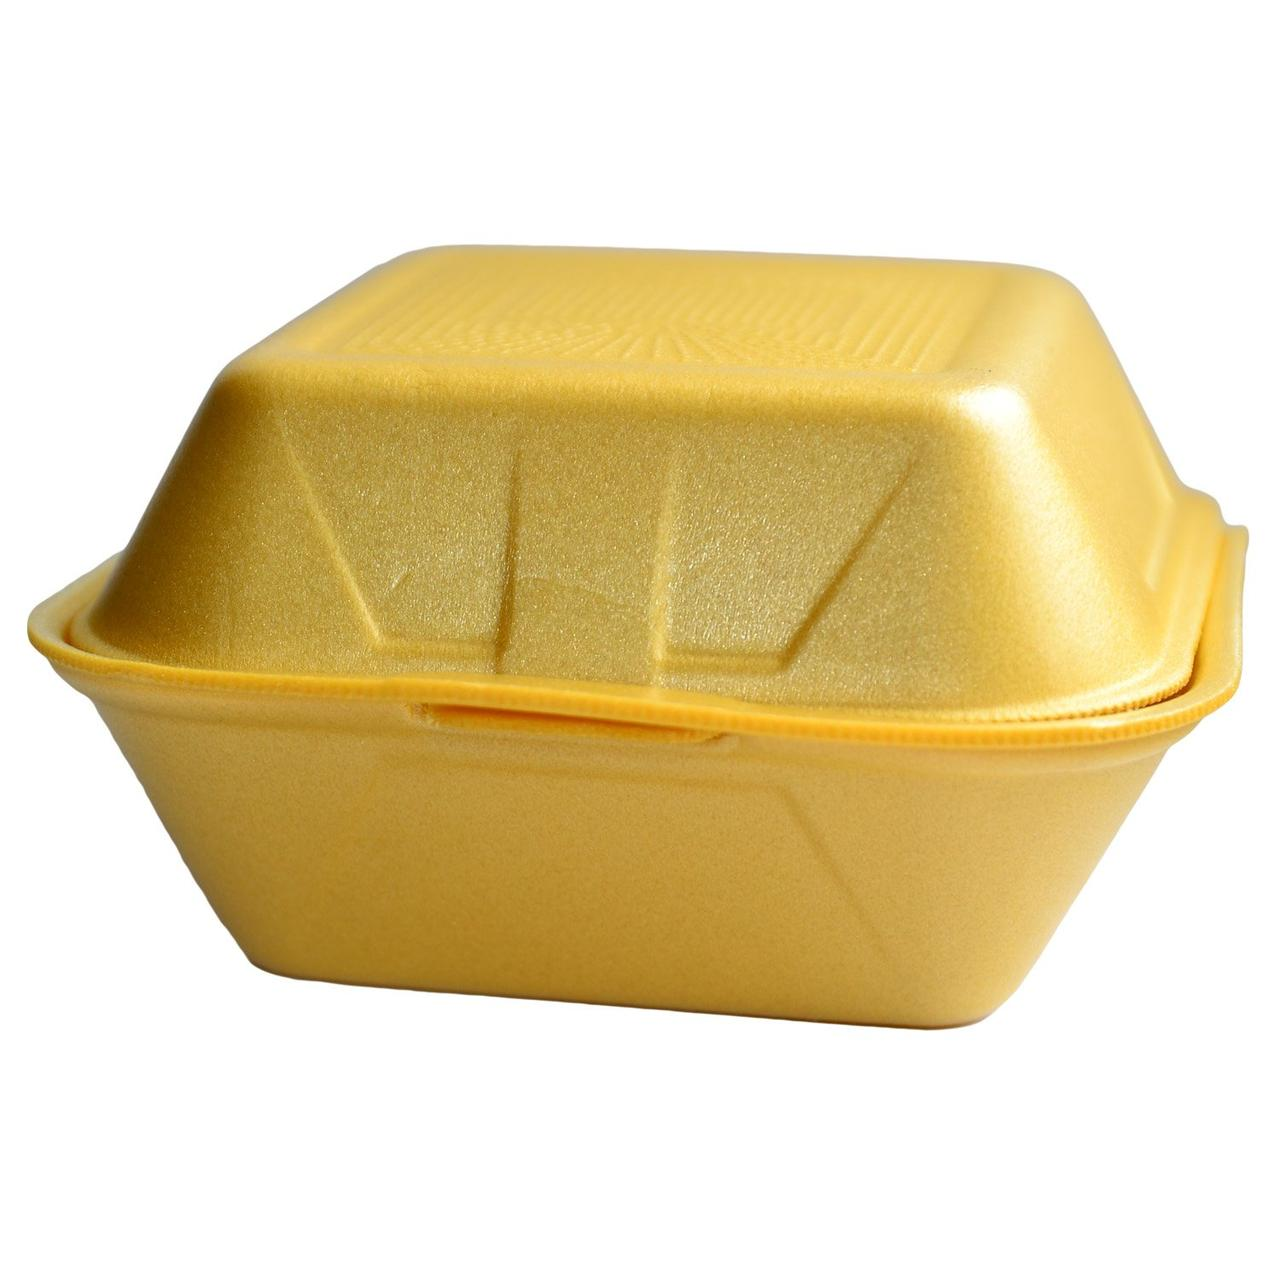 Коробка для гамбургера внеш. 145х145х80мм, внутр. 135х135х75мм, бел/жёлт., ВПС, 500 шт